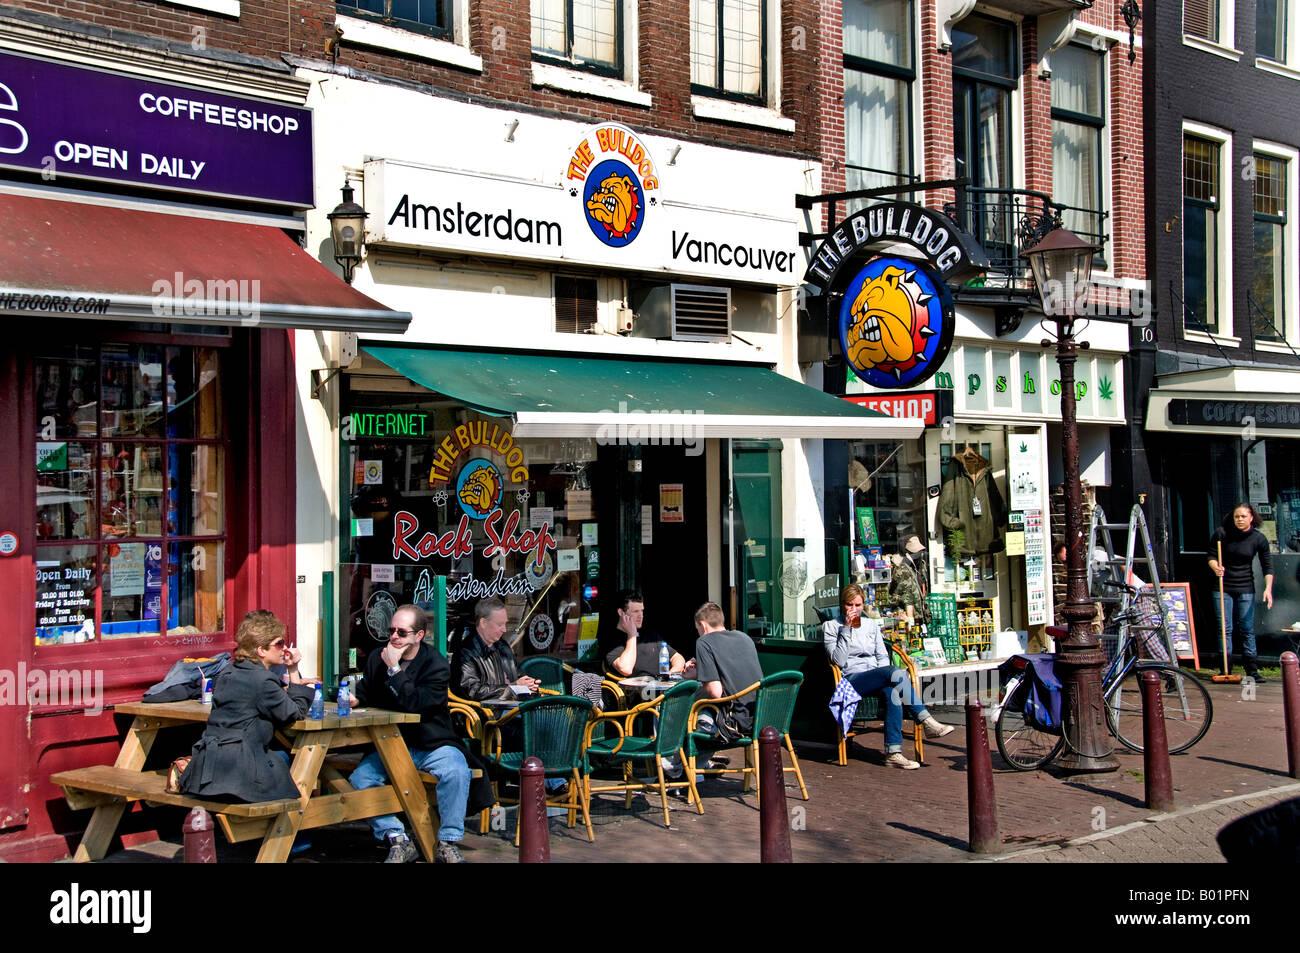 Coffee shop amsterdam online